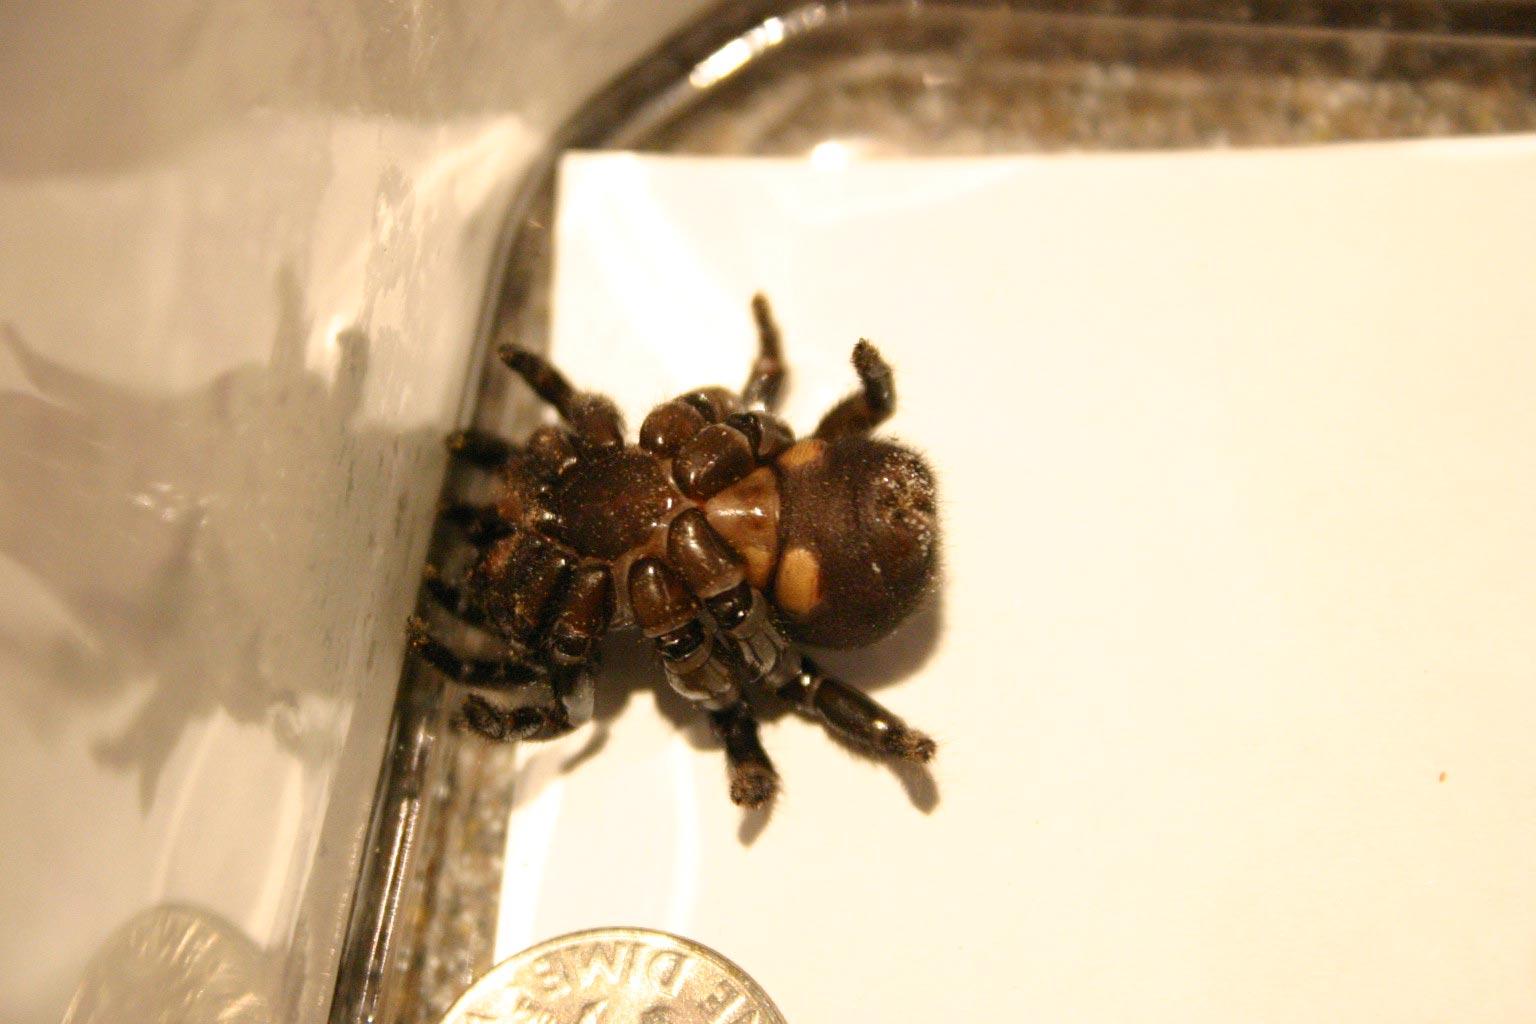 trap door spider & spider trap door 2 | Walter Reeves: The Georgia Gardener Pezcame.Com